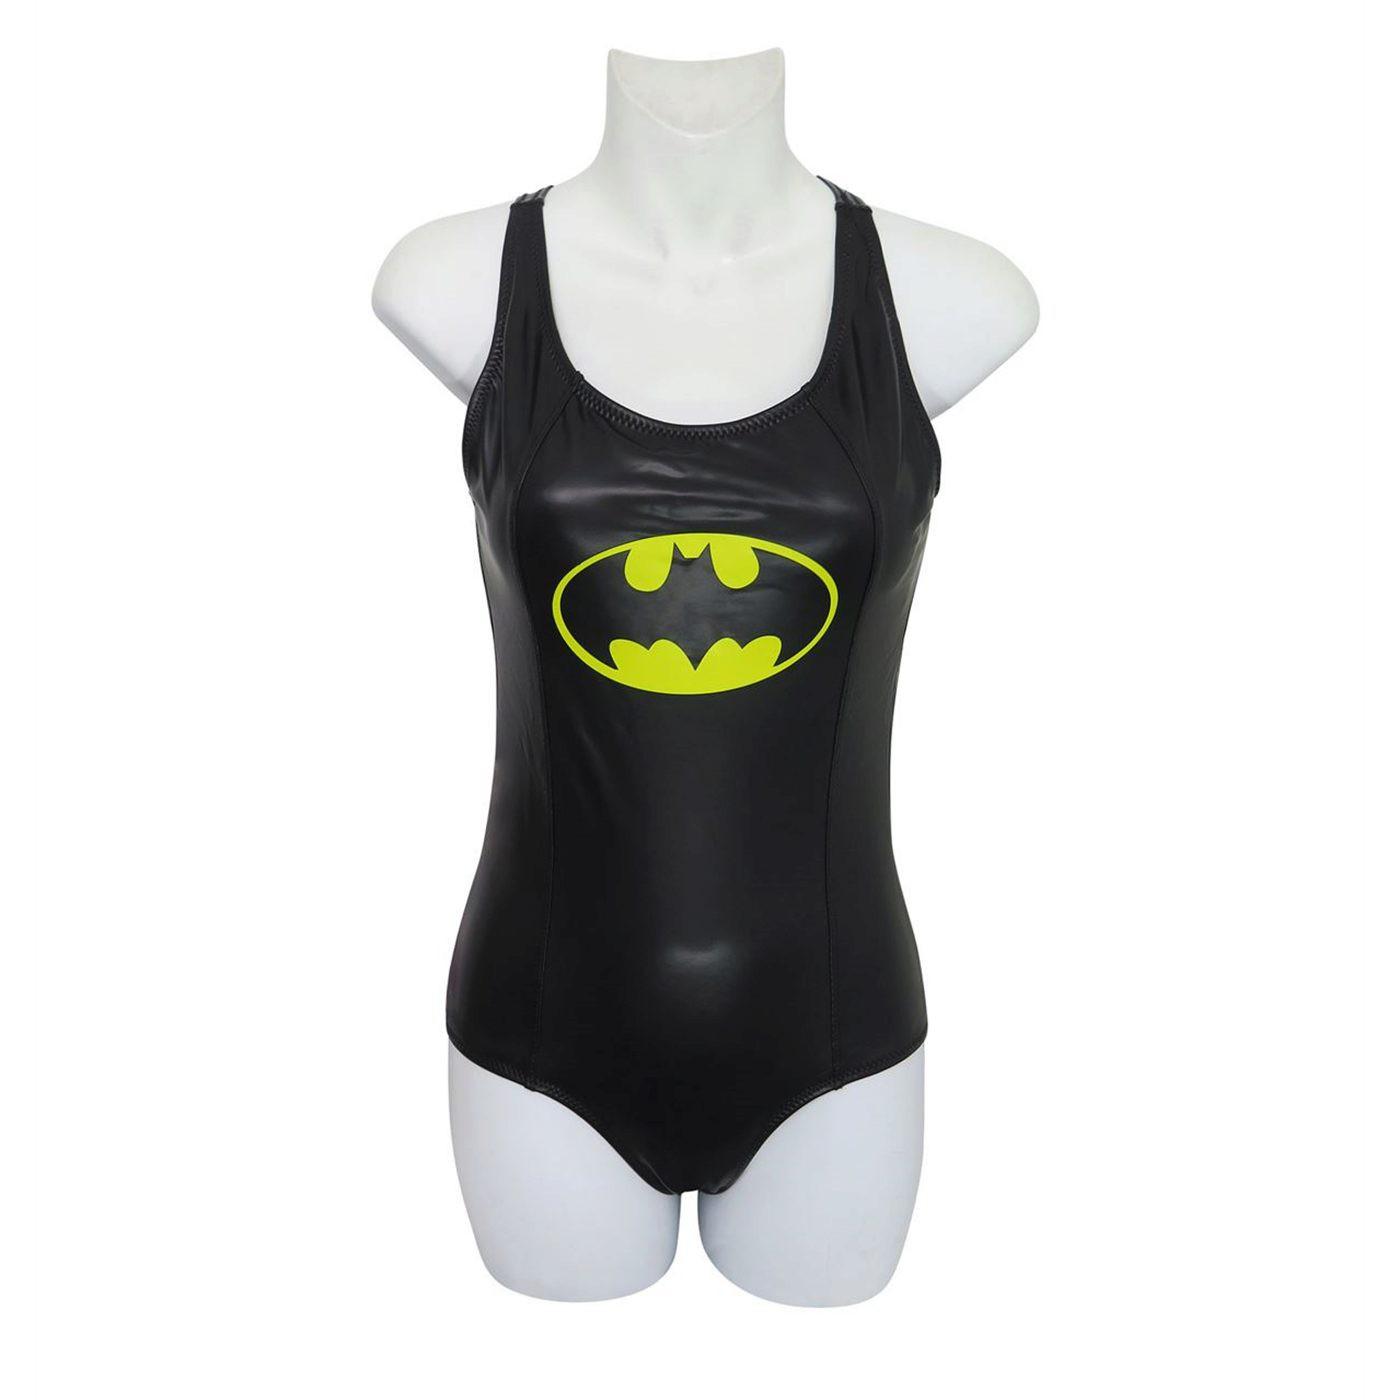 Batman Racerback Keyhole One-Piece Swimsuit